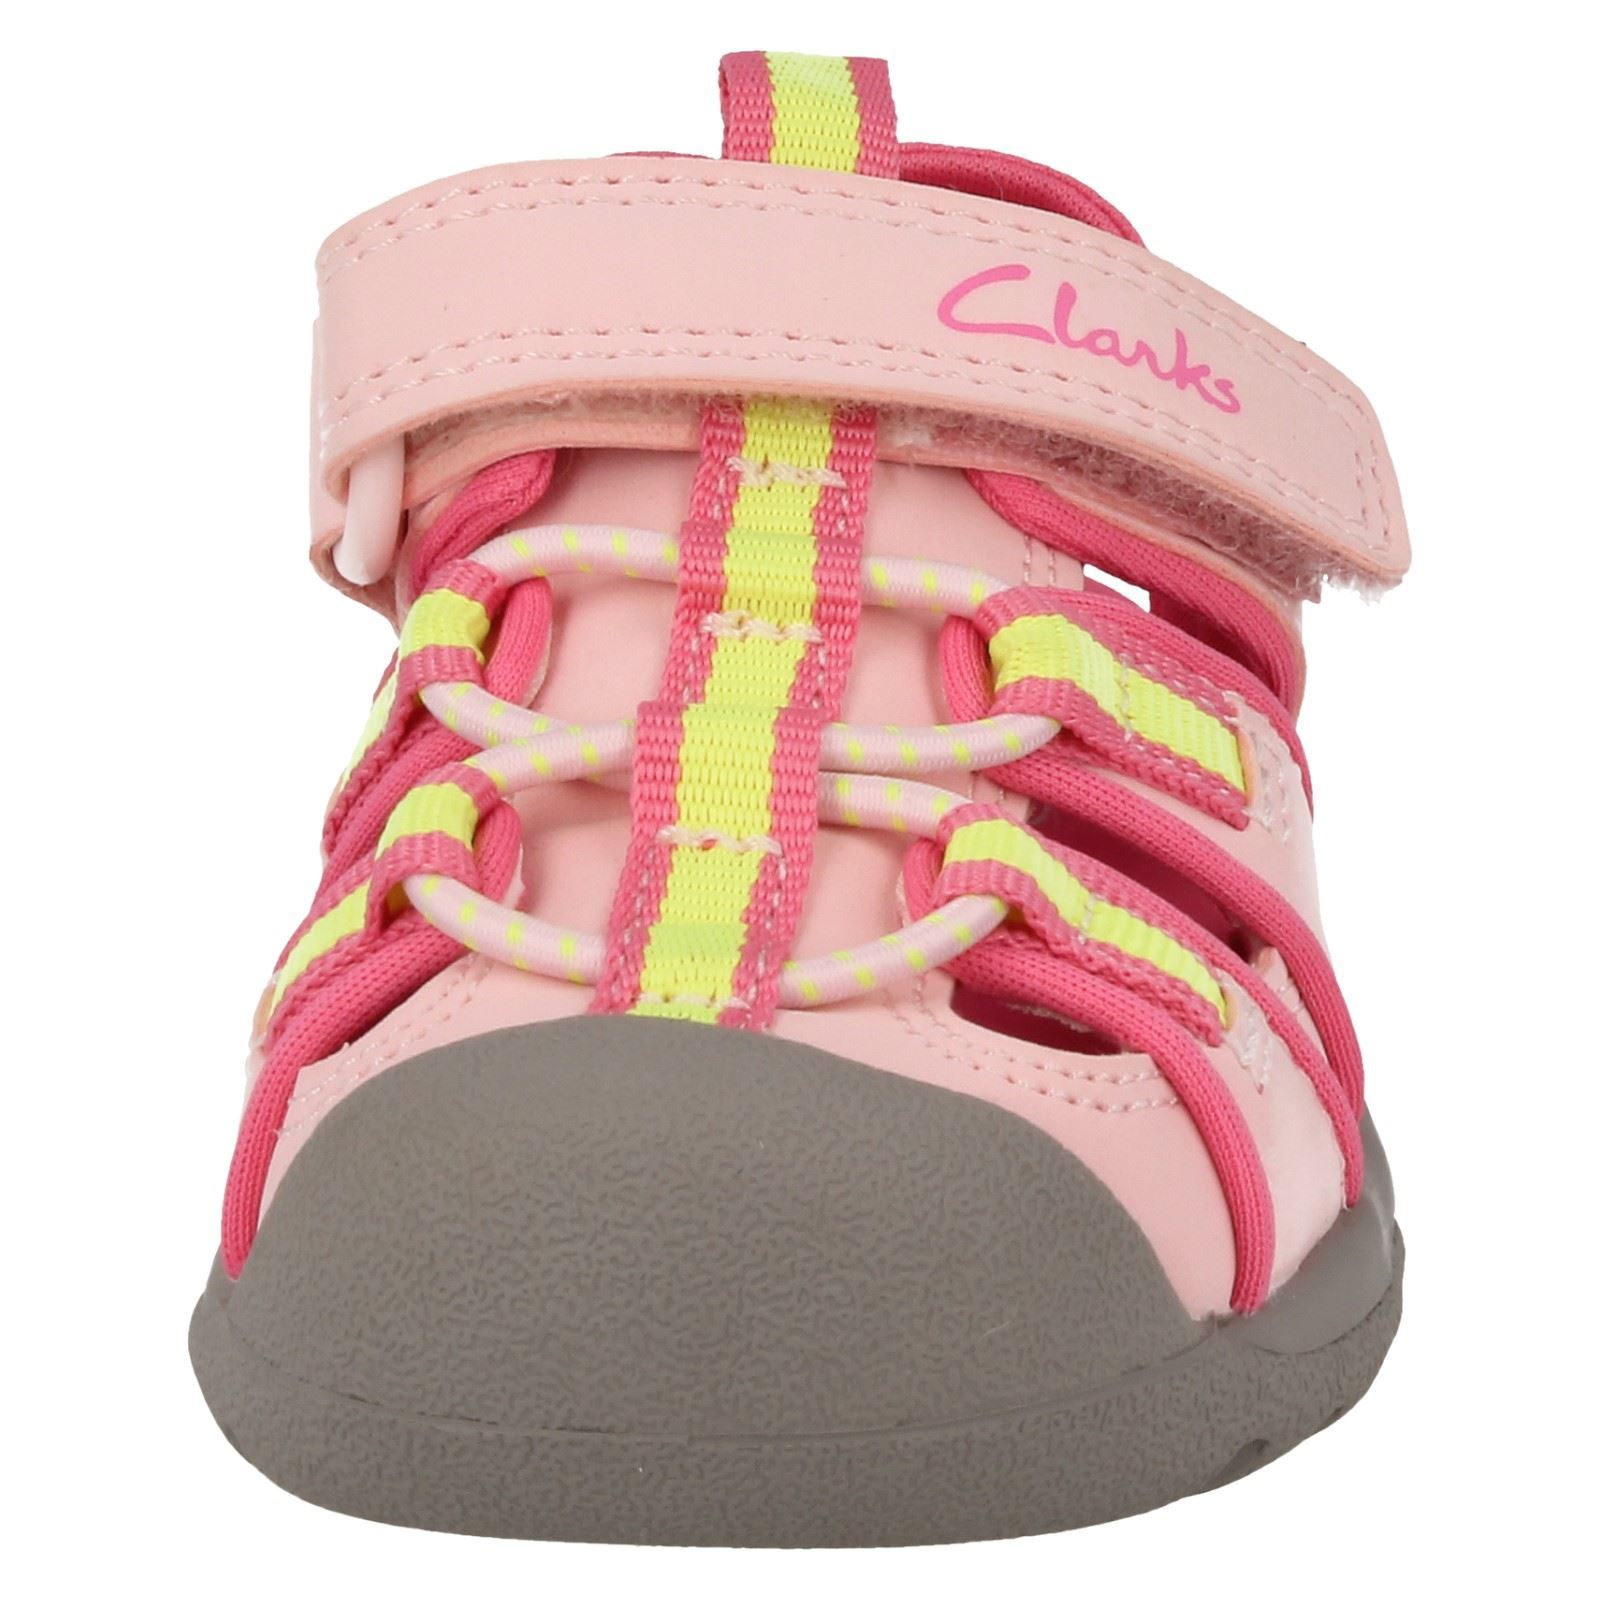 Children Clarks Closed Tos Hook & Loop Doodle Sandals Style - BeachTide